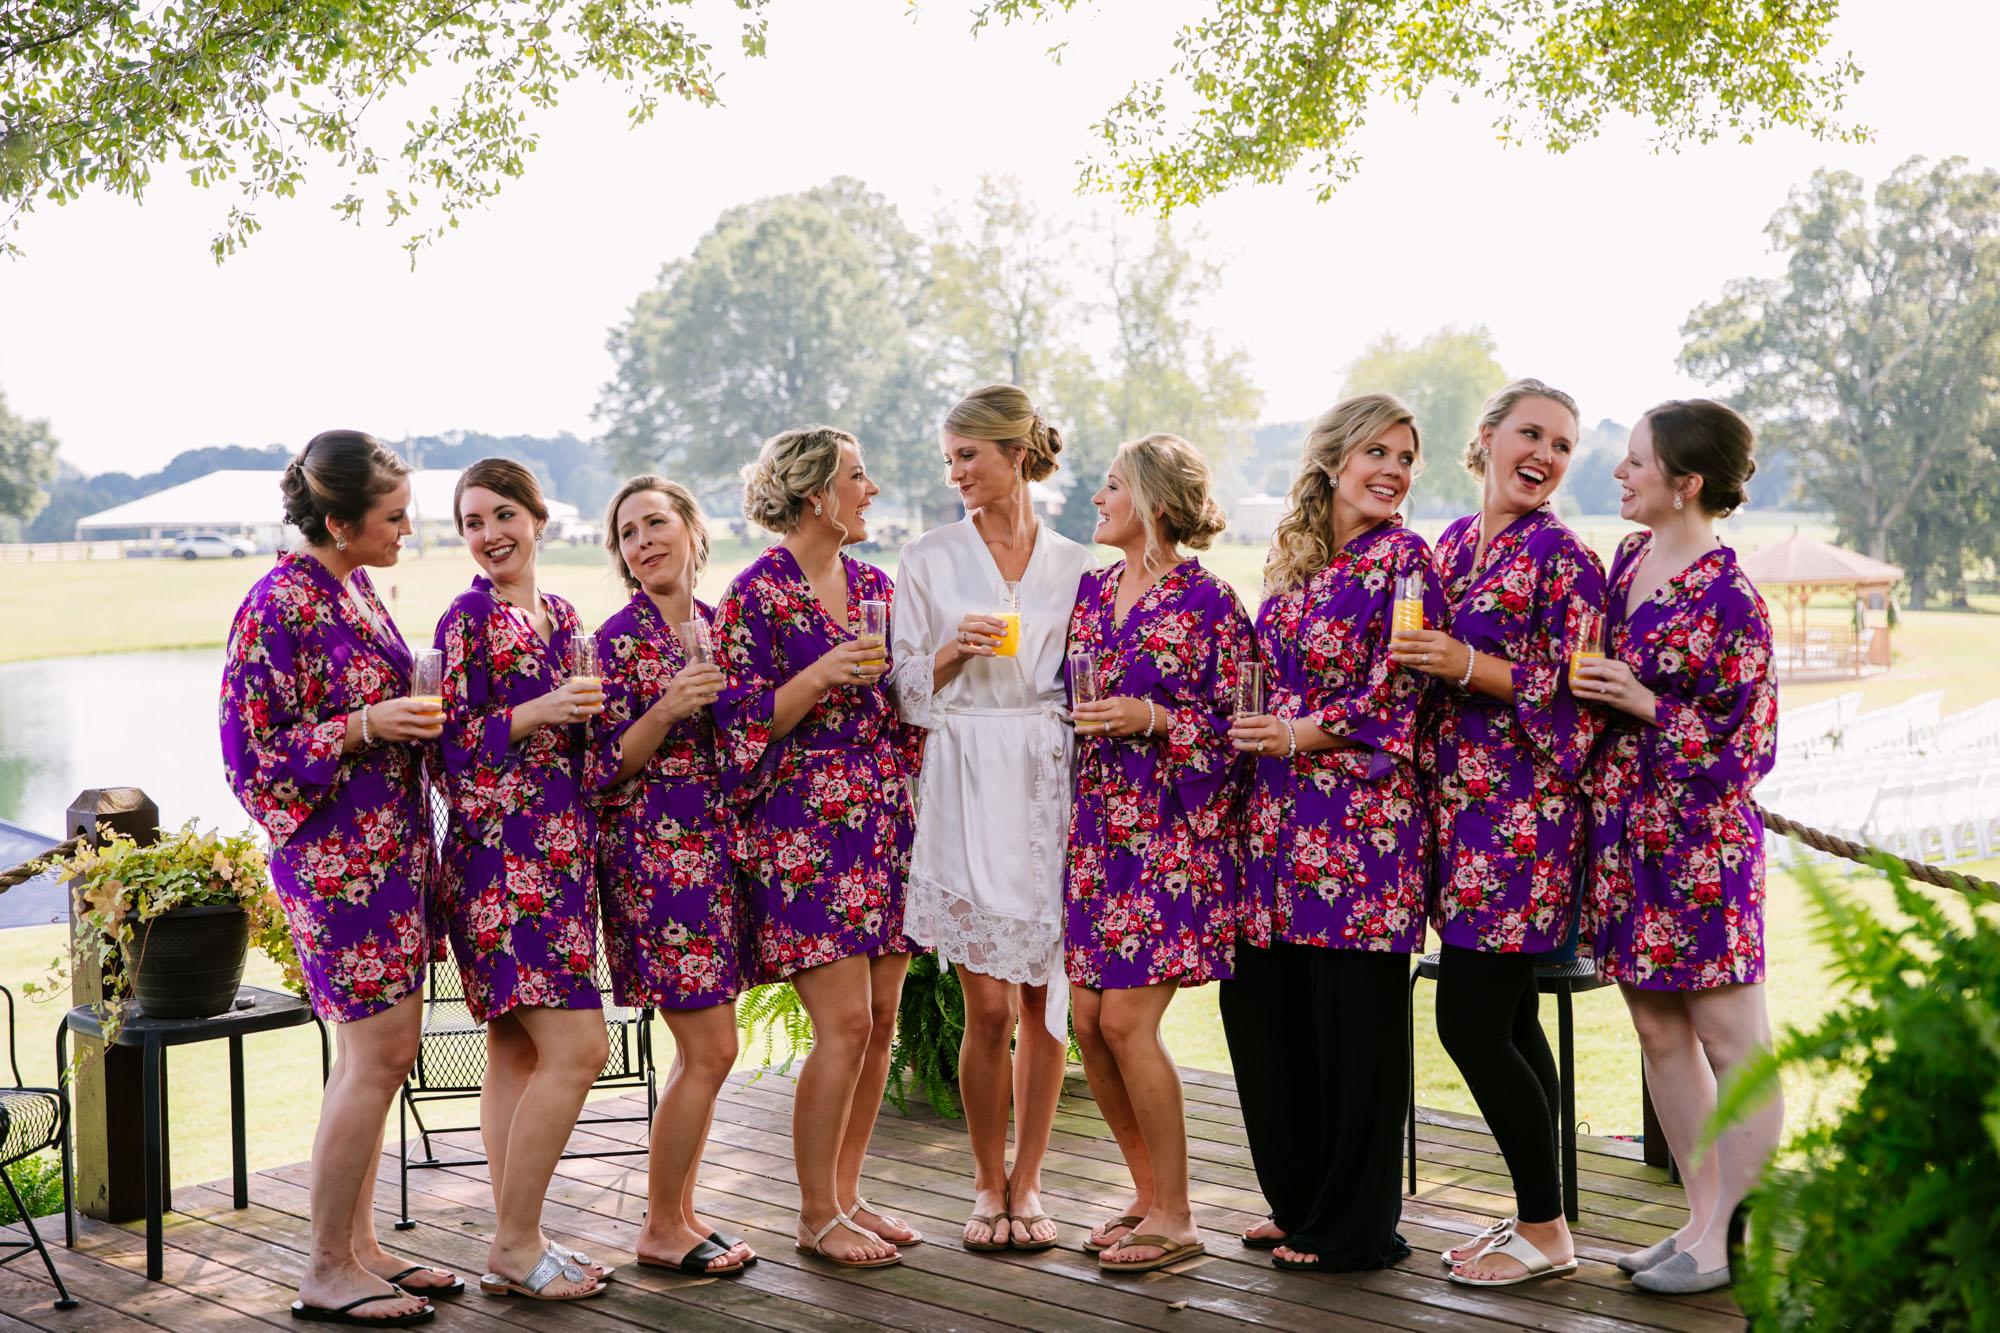 Waynesville, NC Wedding Photography | Bridesmaids with Mimosas